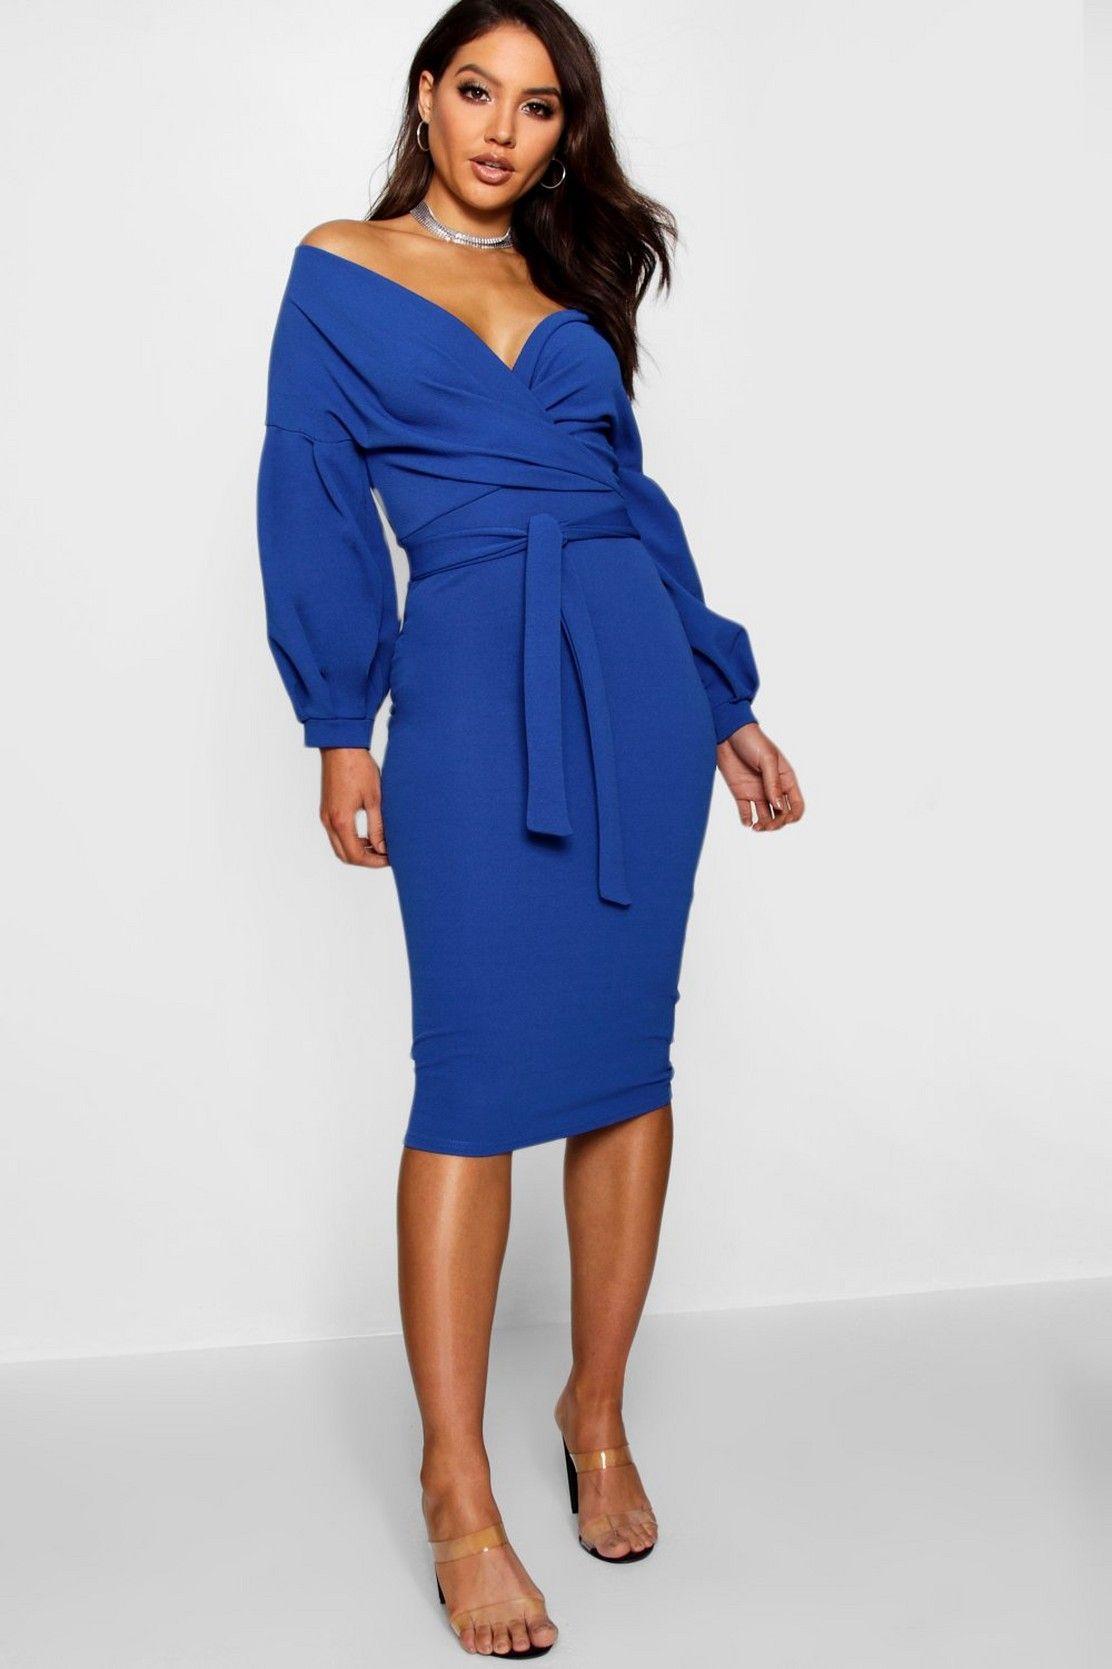 Off The Shoulder Wrap Midi Dress Boohoo Uk Blue Midi Dress Midi Dress Bodycon Fashion